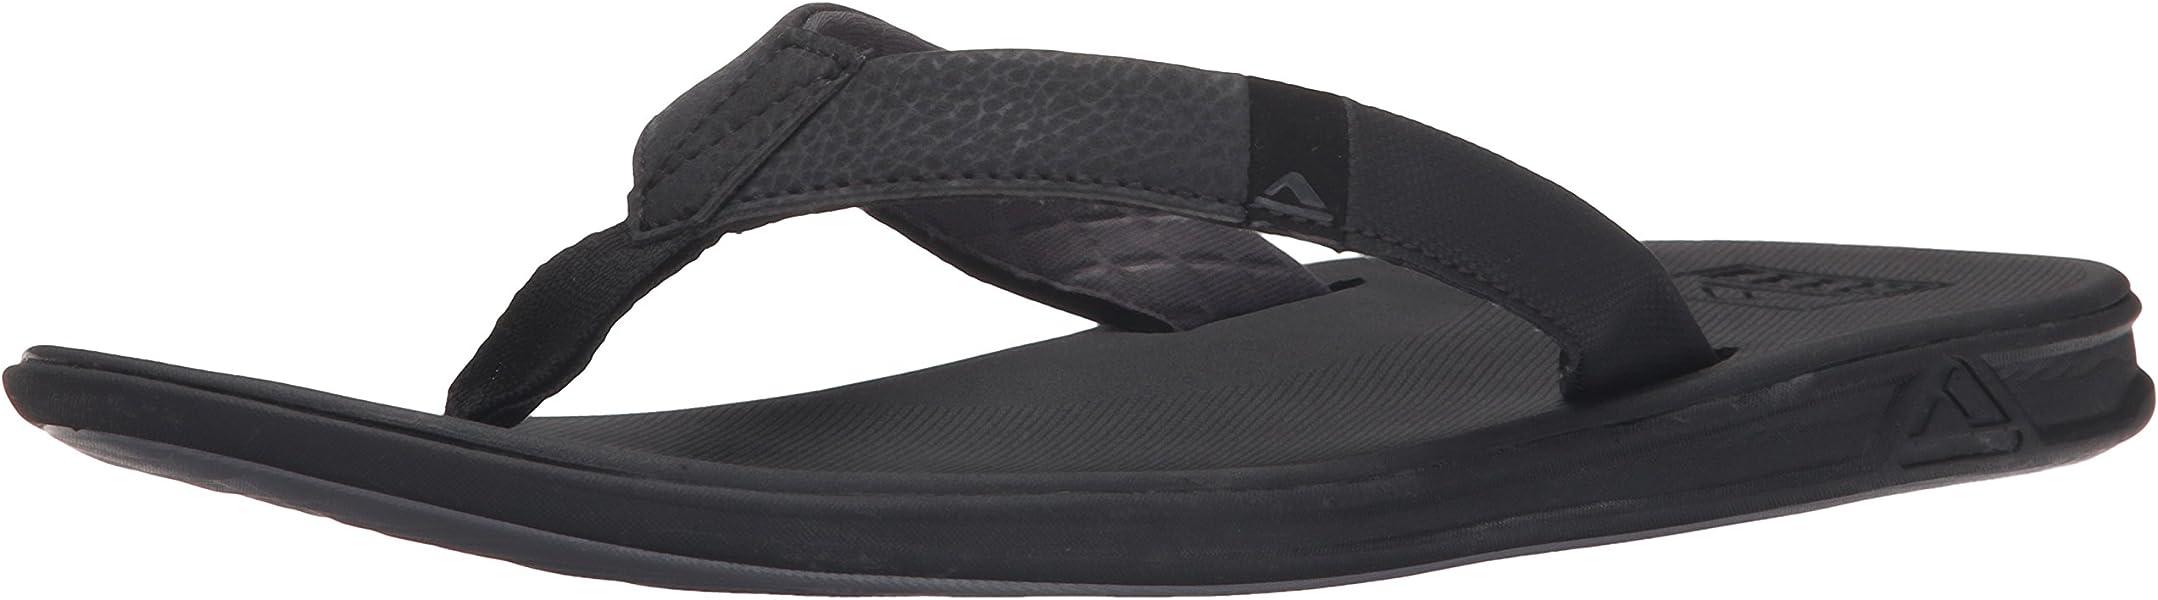 7730e514d22f Reef Men s Slammed Rover Flip Flop Black 6 M US  Amazon.ca  Shoes ...